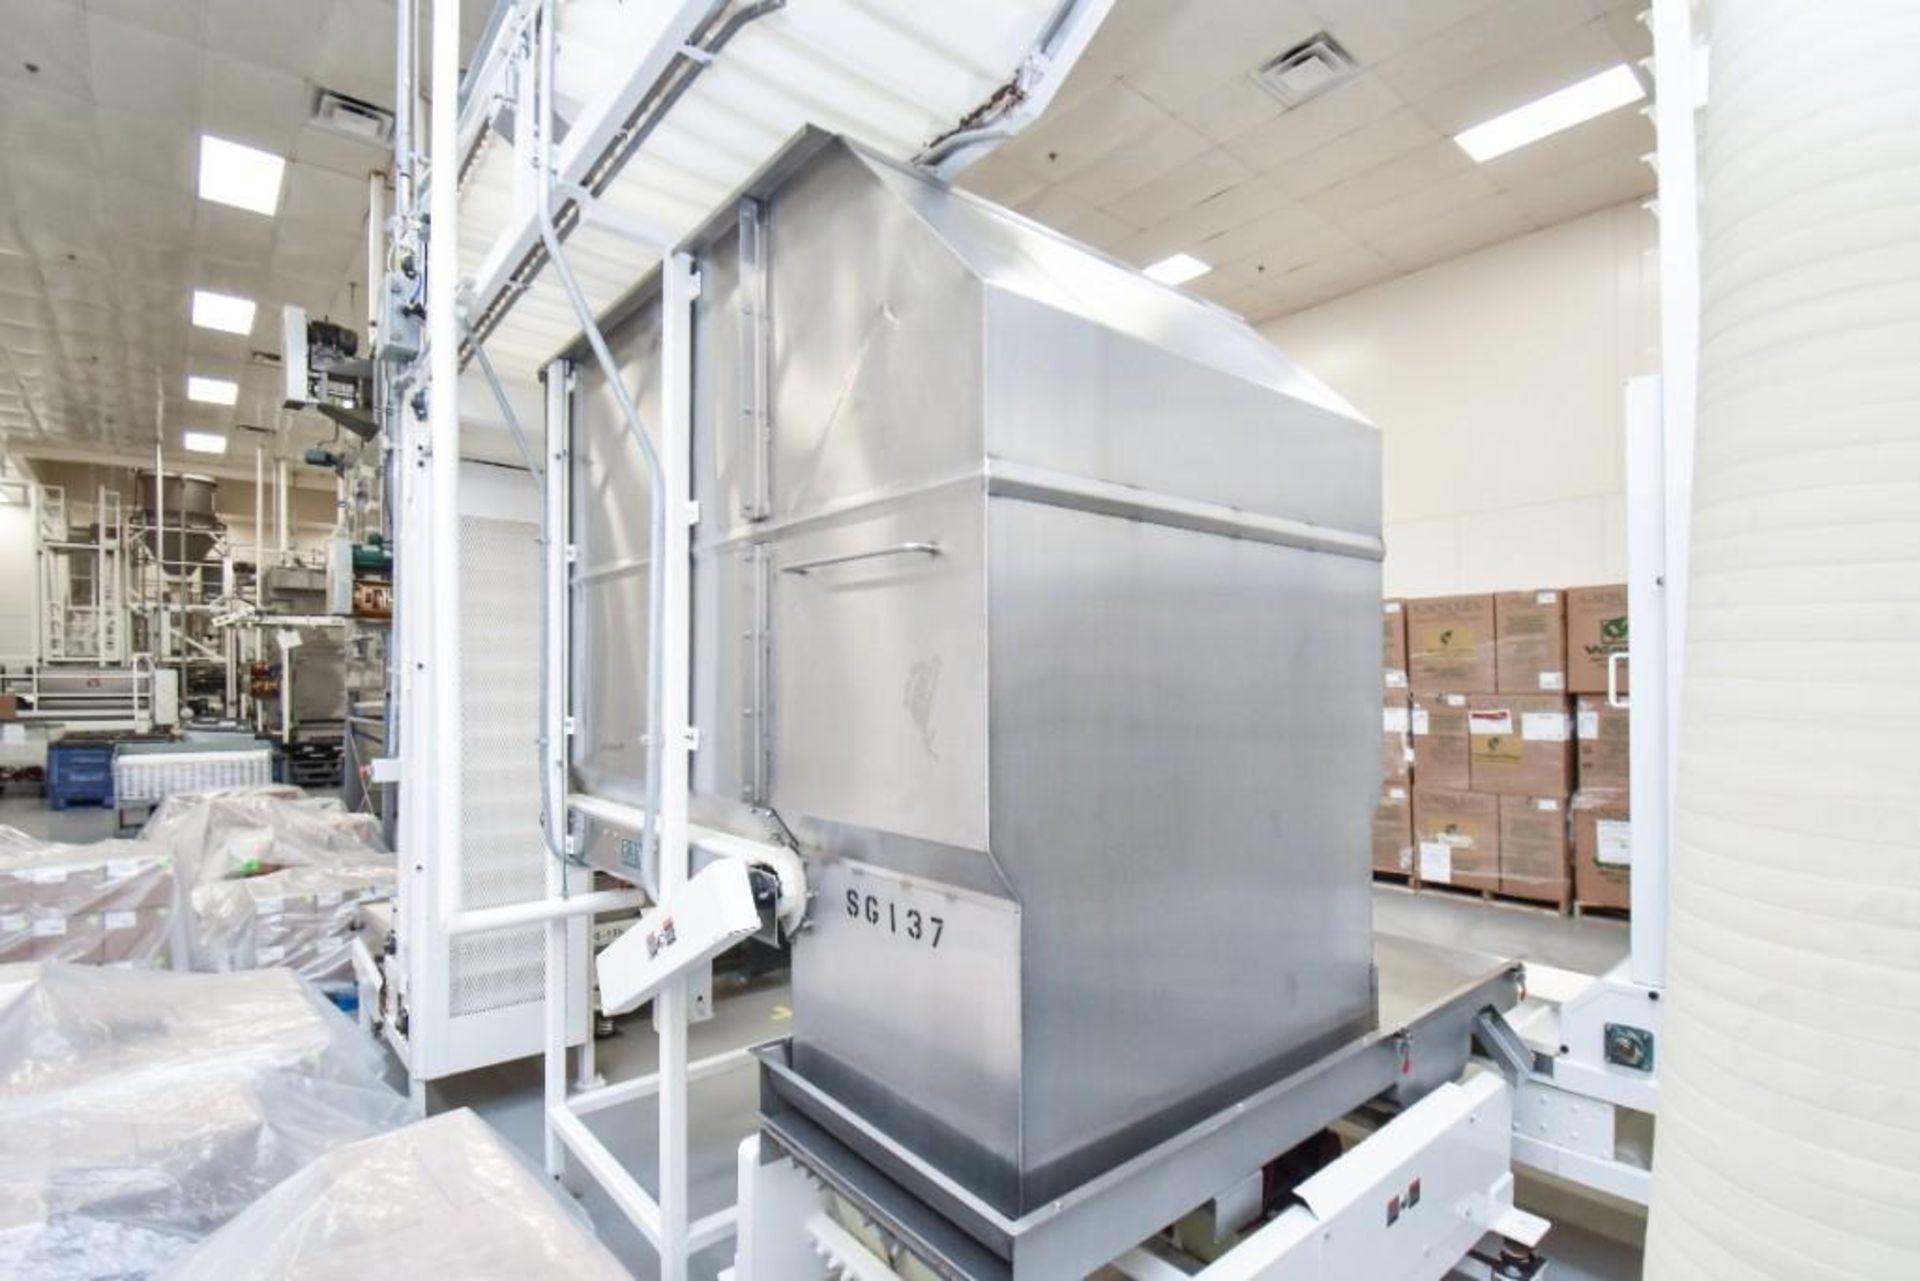 RBM Accumulation Hopper Conveyor and Vibratory Deck AC-1-4X4-6 - Image 5 of 11